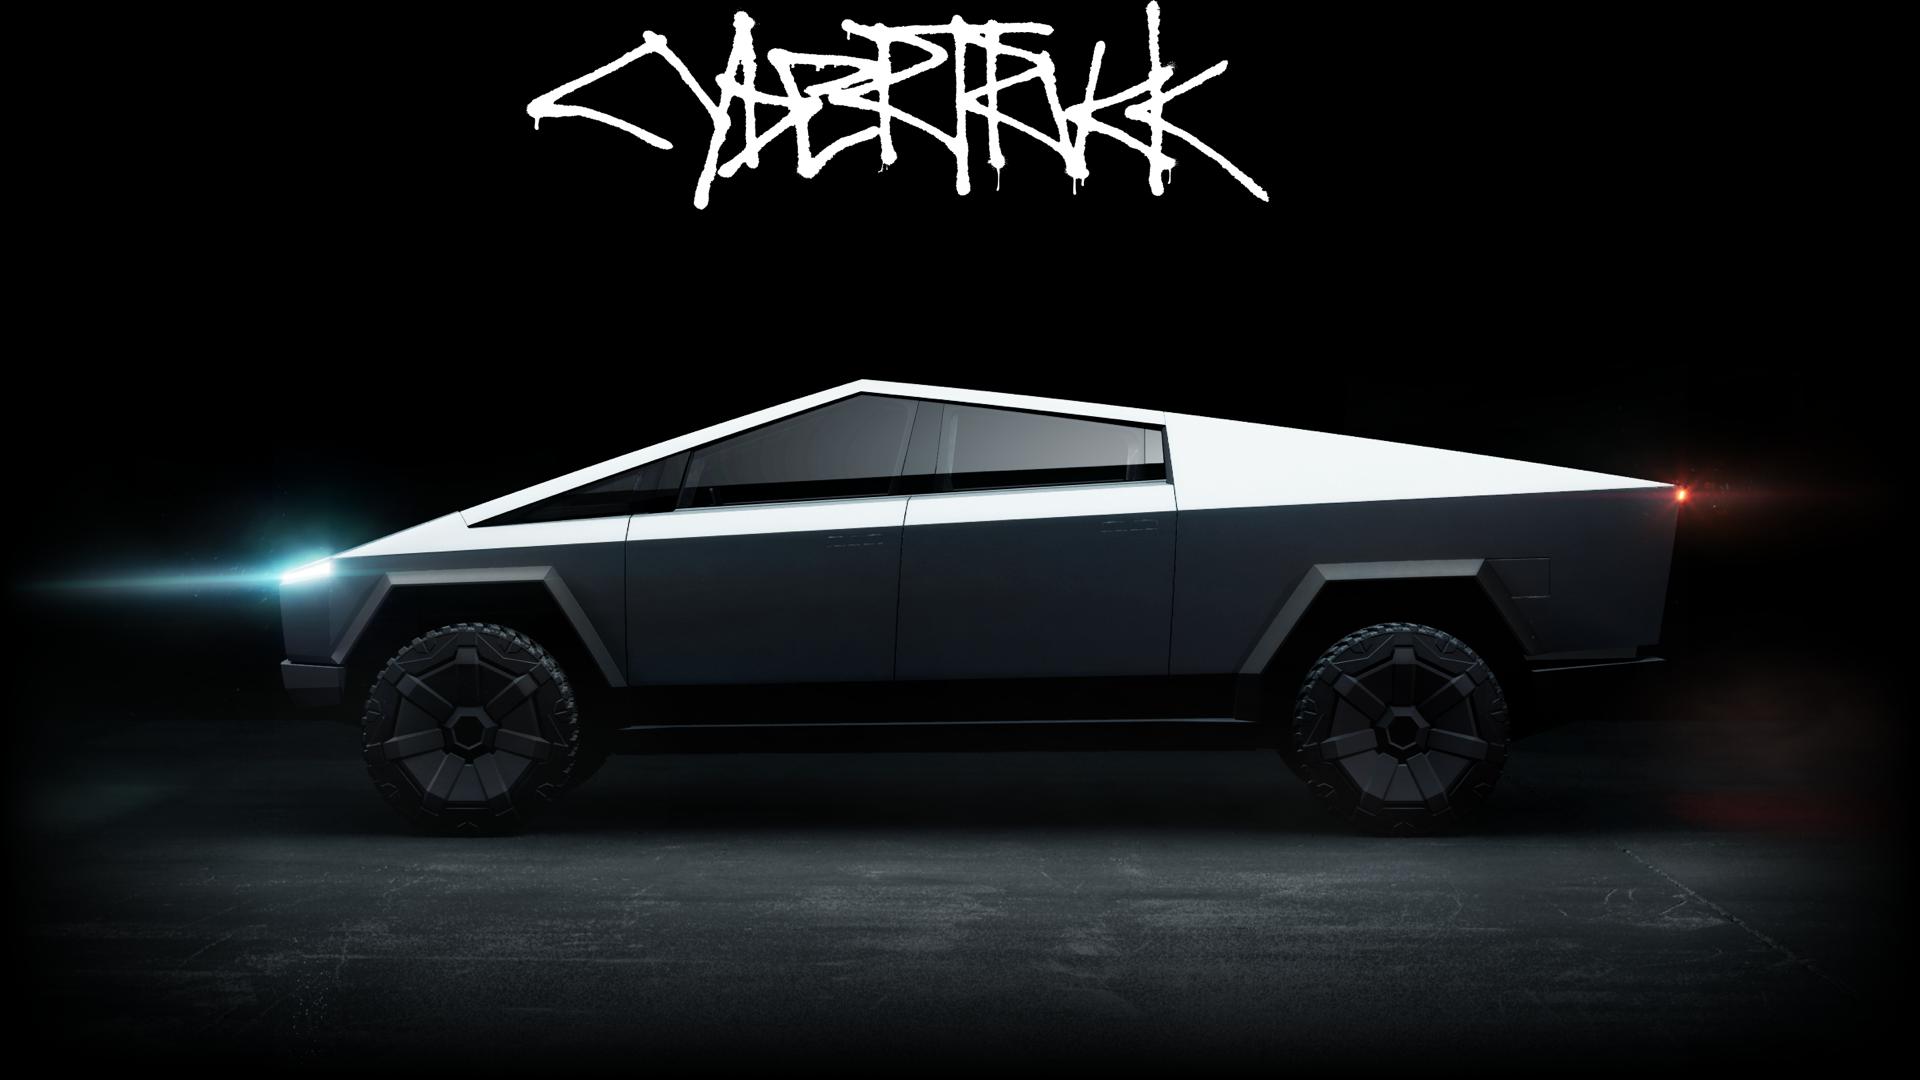 Pack of 1 180mm Cybertruck Model S 3 X Y Roadster P100D Vehicle Logo Emblem GREATCO Dual Motor Letters Gloss Black Side//Front//Rear Logo For TESLA